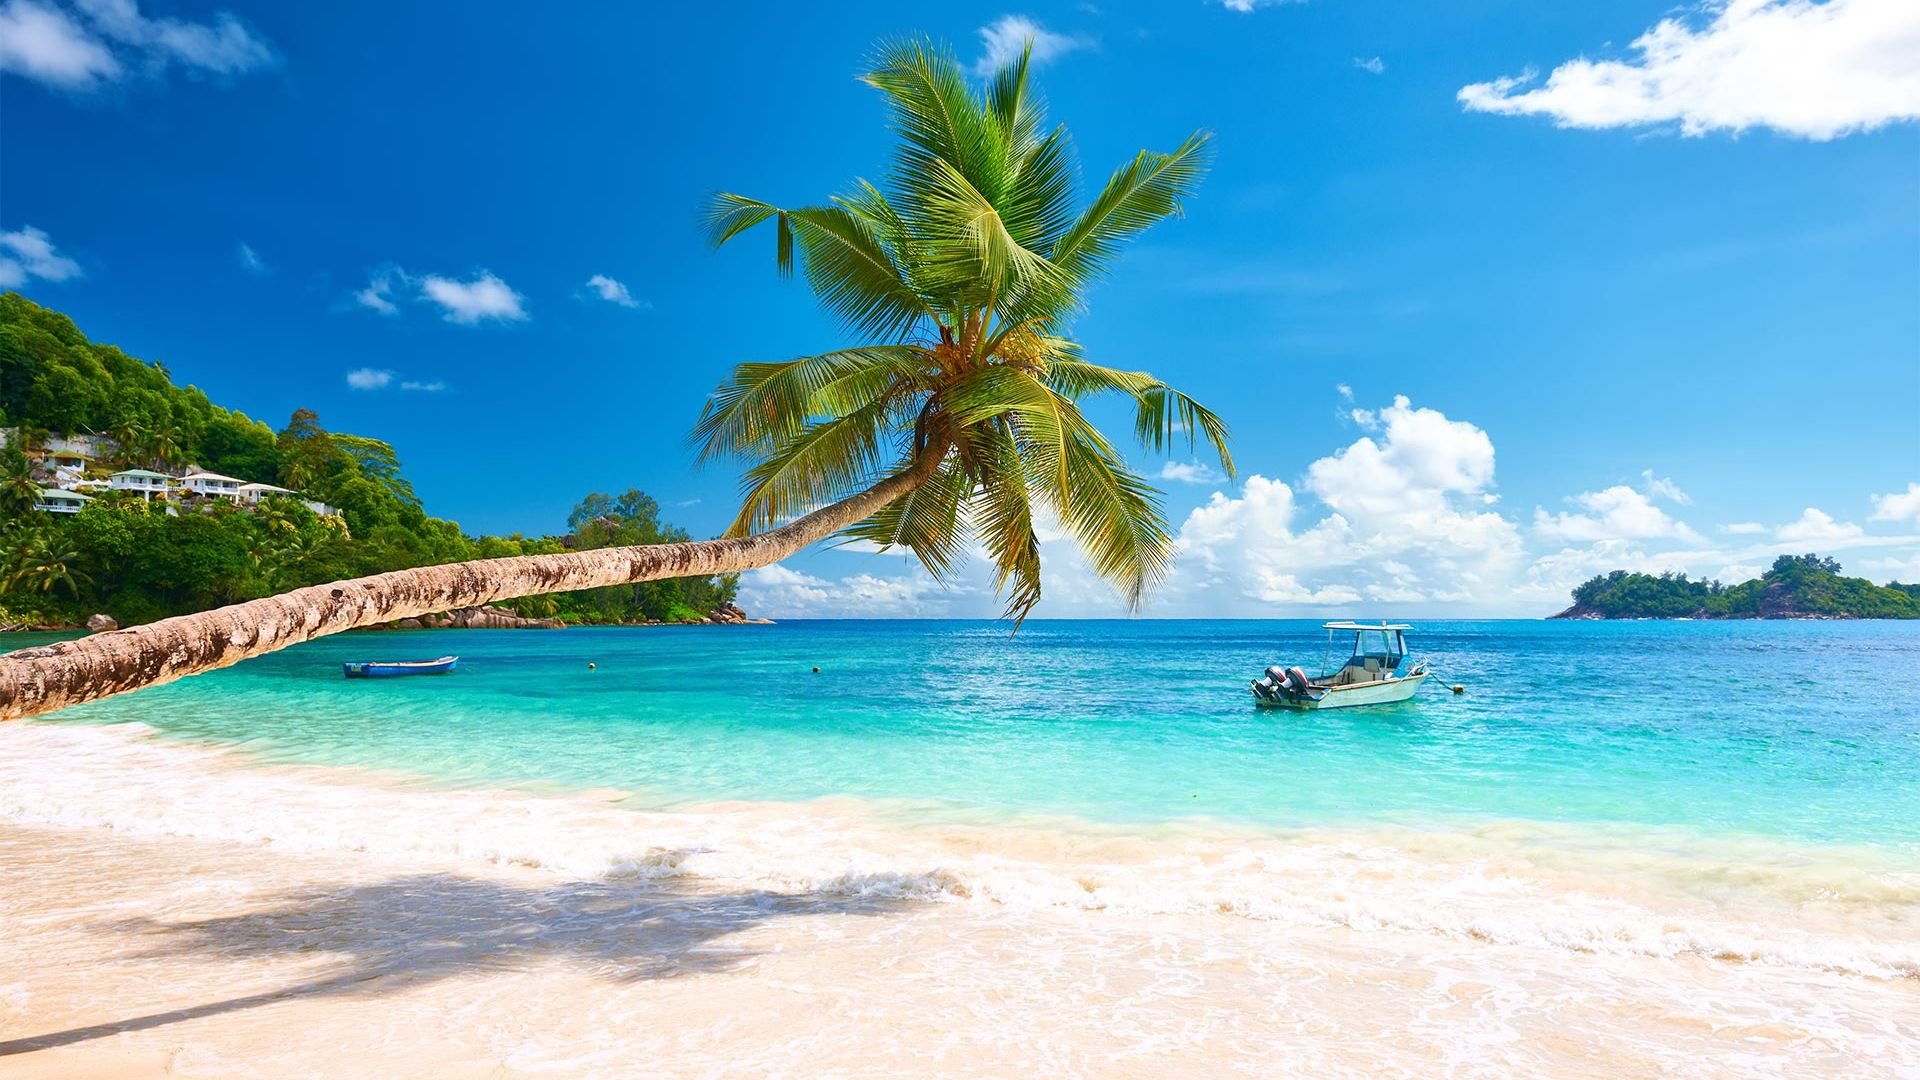 Sejur plaja Insula Mahe, Seychelles, 10 zile